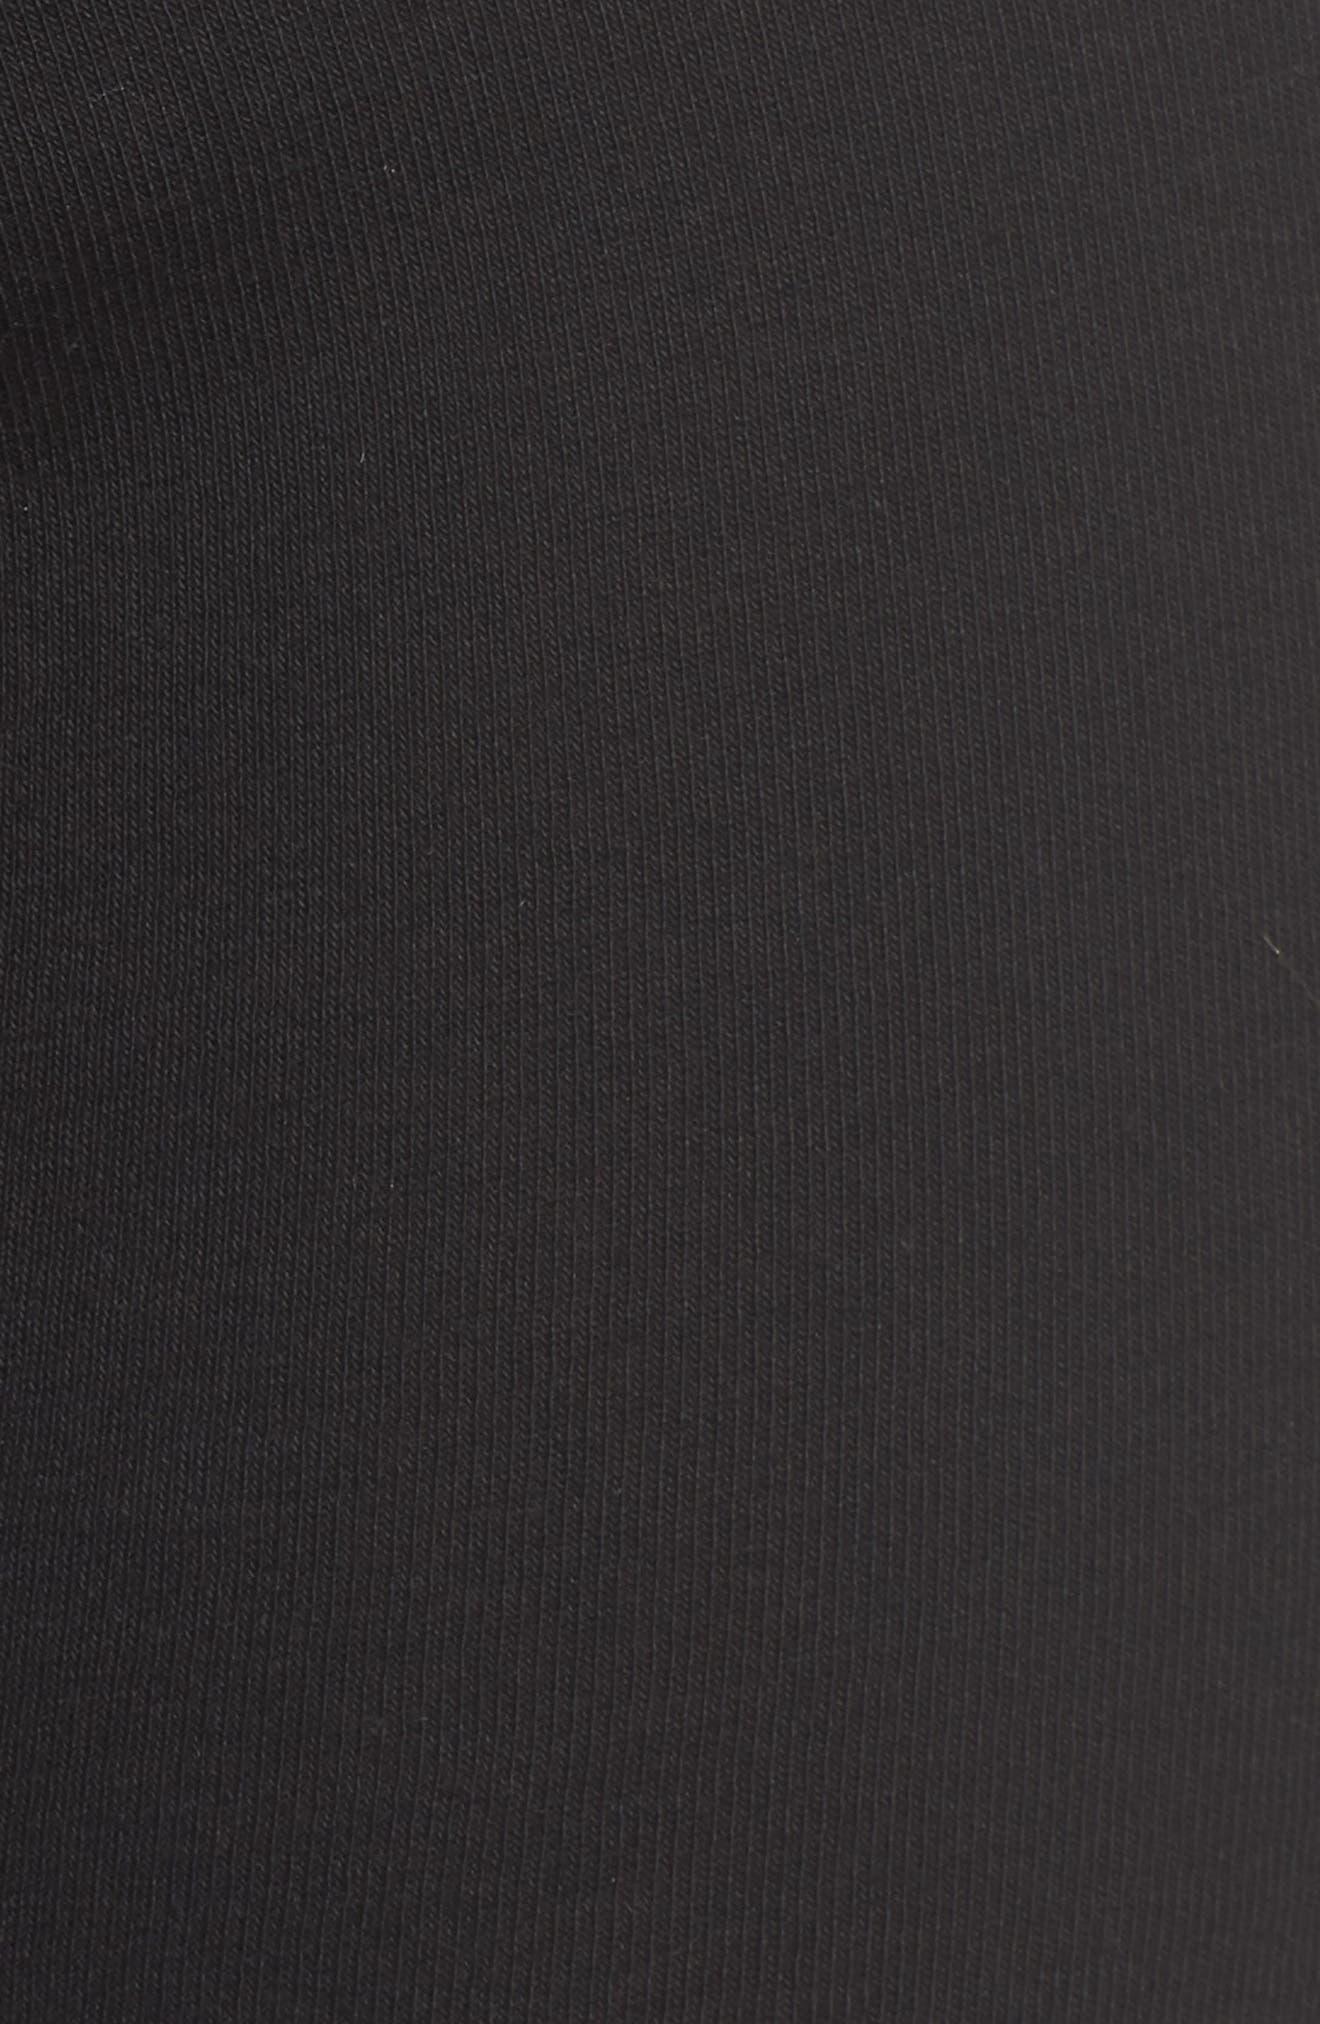 3-Pack Boxer Briefs,                             Alternate thumbnail 6, color,                             BLACK/ W ORIOLE/ STONY/ BLUE